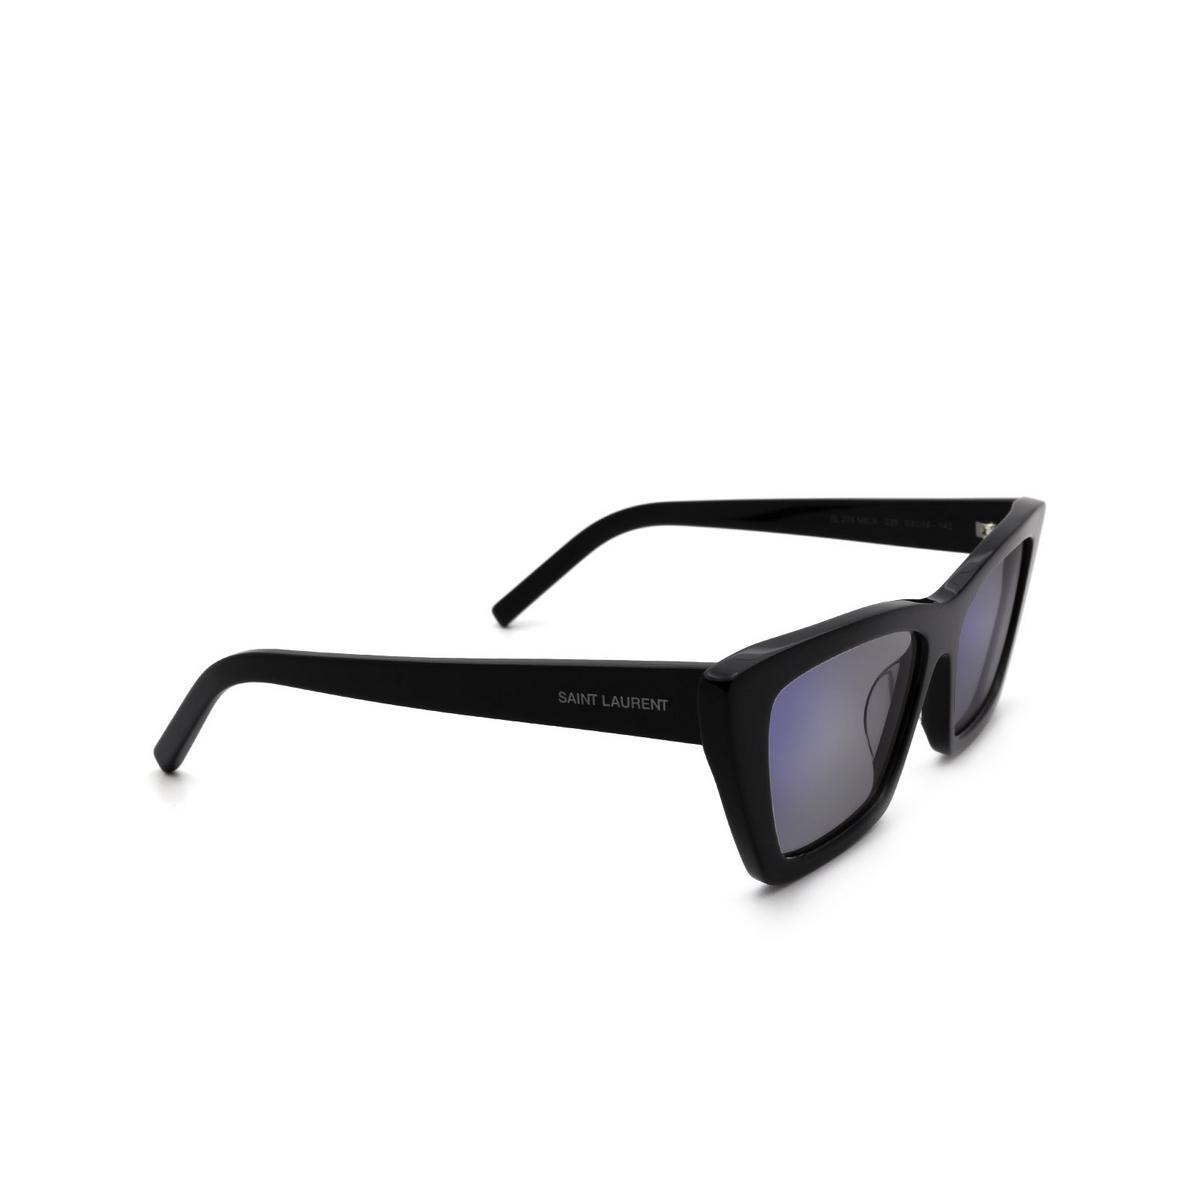 Saint Laurent® Cat-eye Sunglasses: Mica SL 276 color Shiny Black 025.